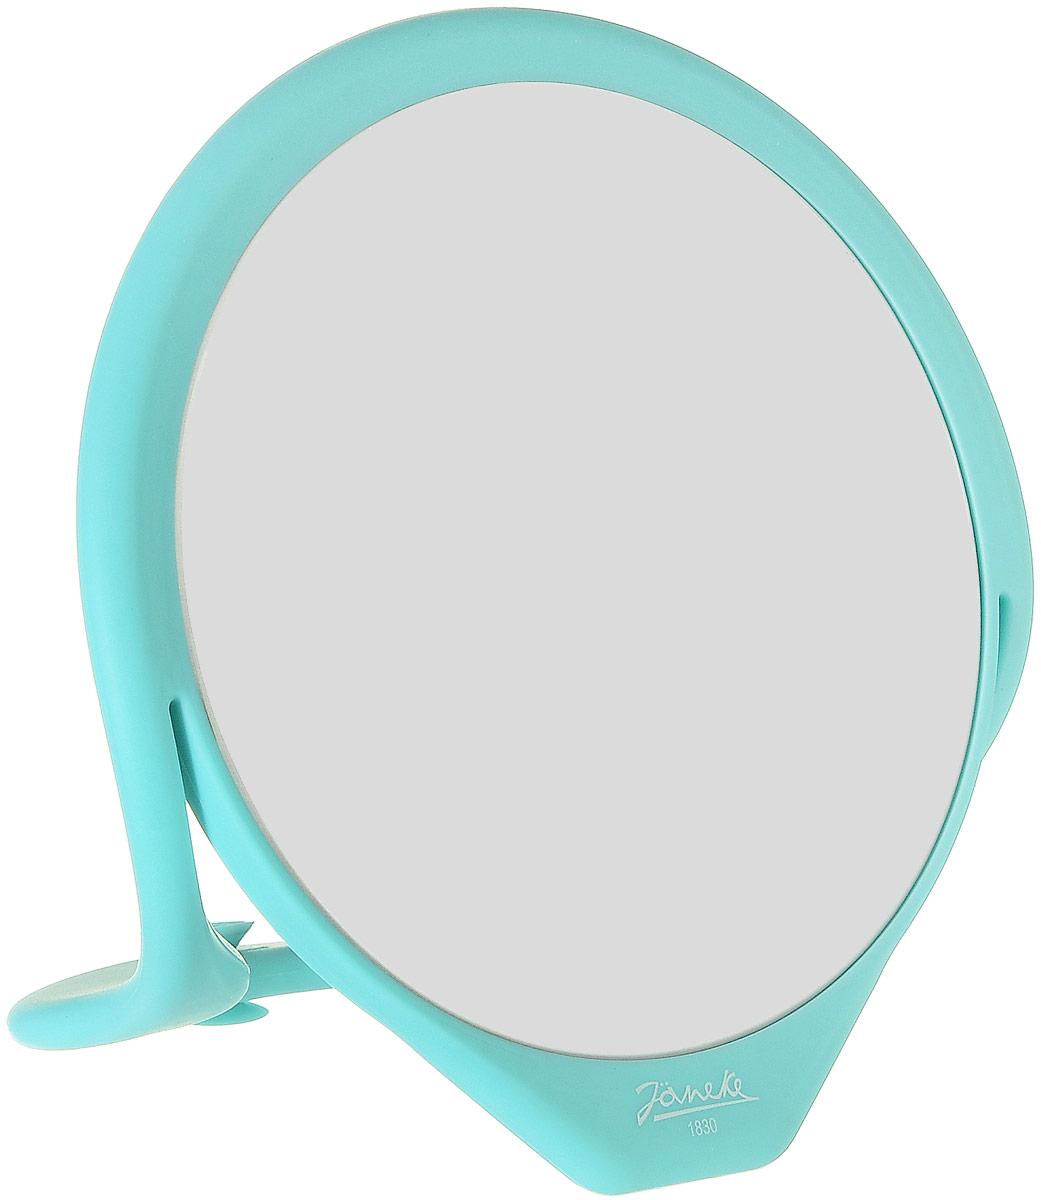 Janeke Зеркало настольное, 10445 TSE 808608